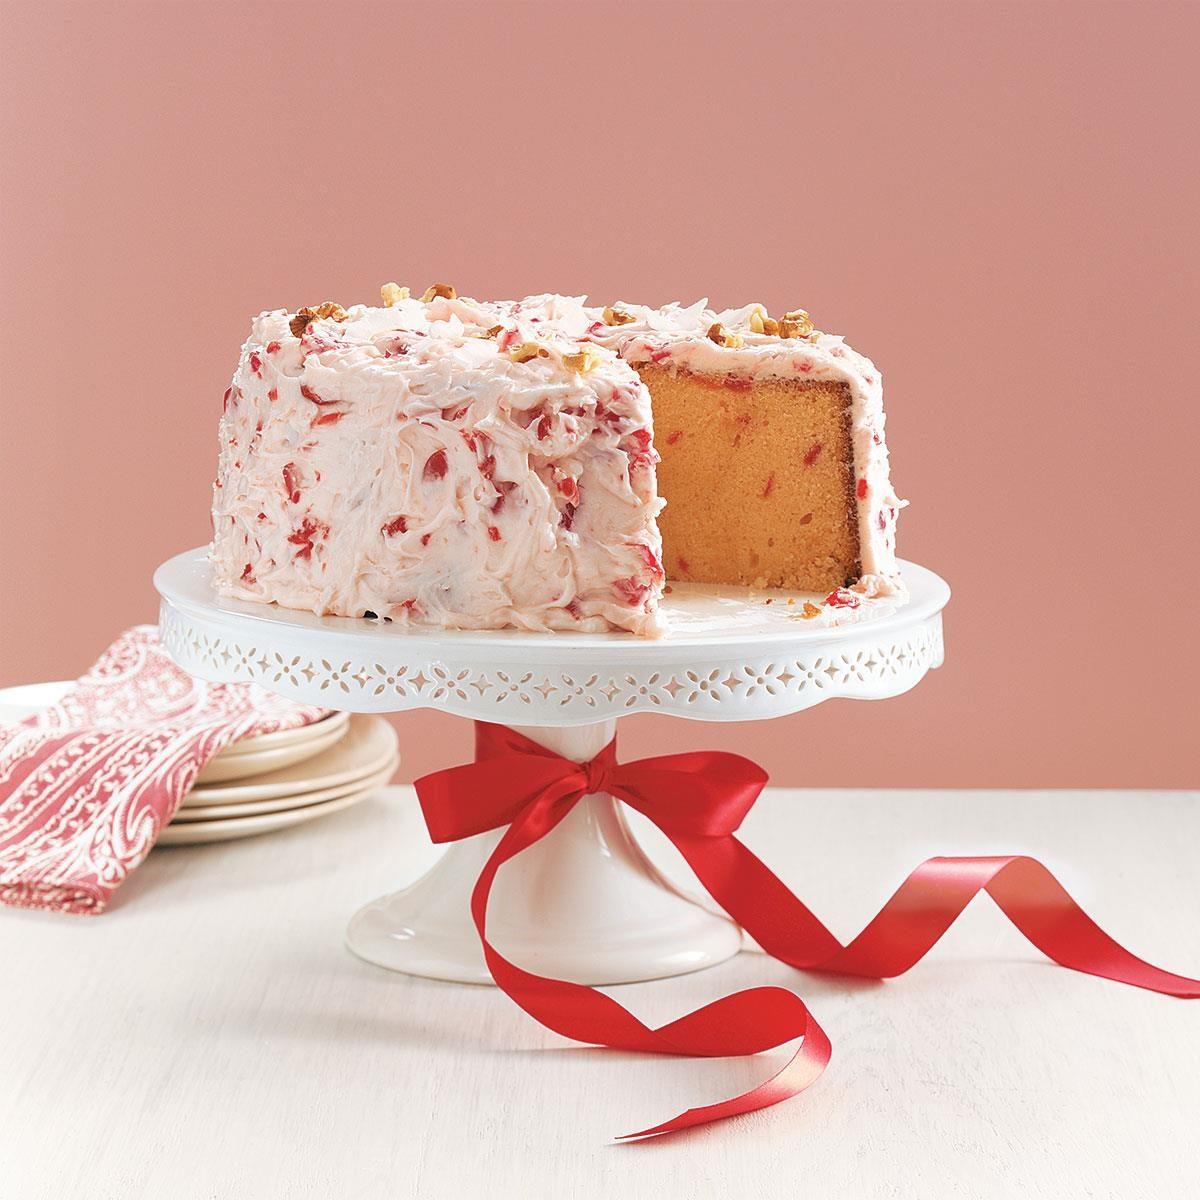 Cherry Pound Cake Recipe | Taste of Home